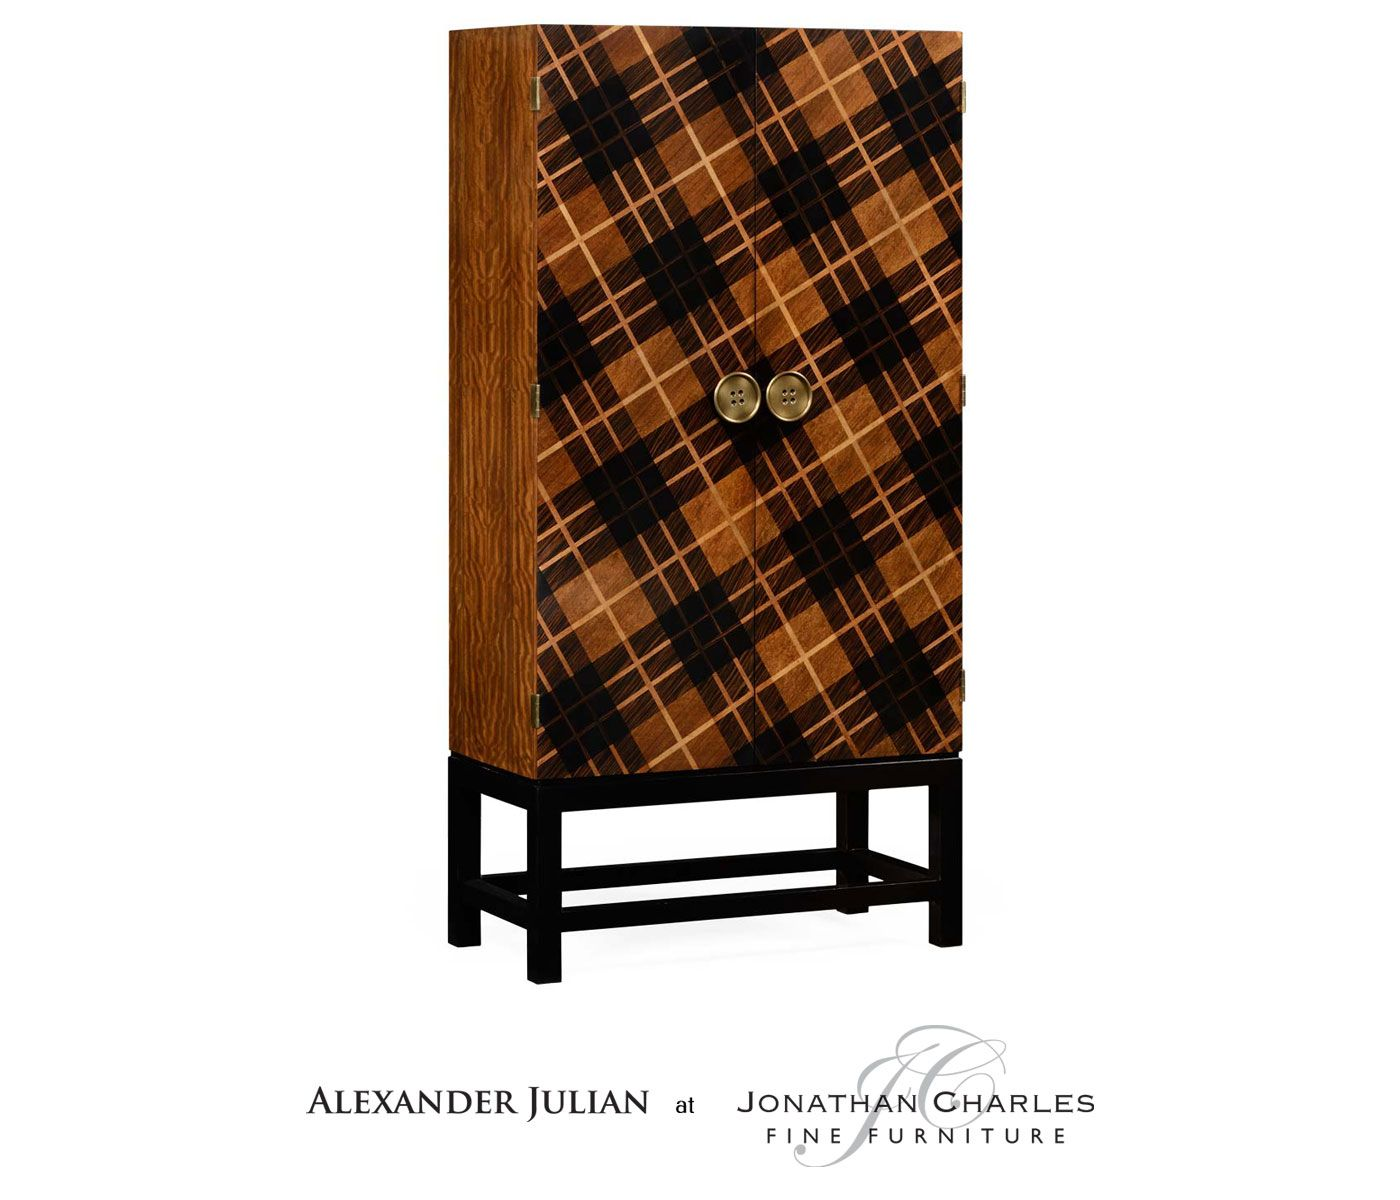 Tartan Haberdashery Chest Satinwood Necktie Coffee Table #hpmkt Extraordinary Alexander Julian Dining Room Furniture Decorating Inspiration